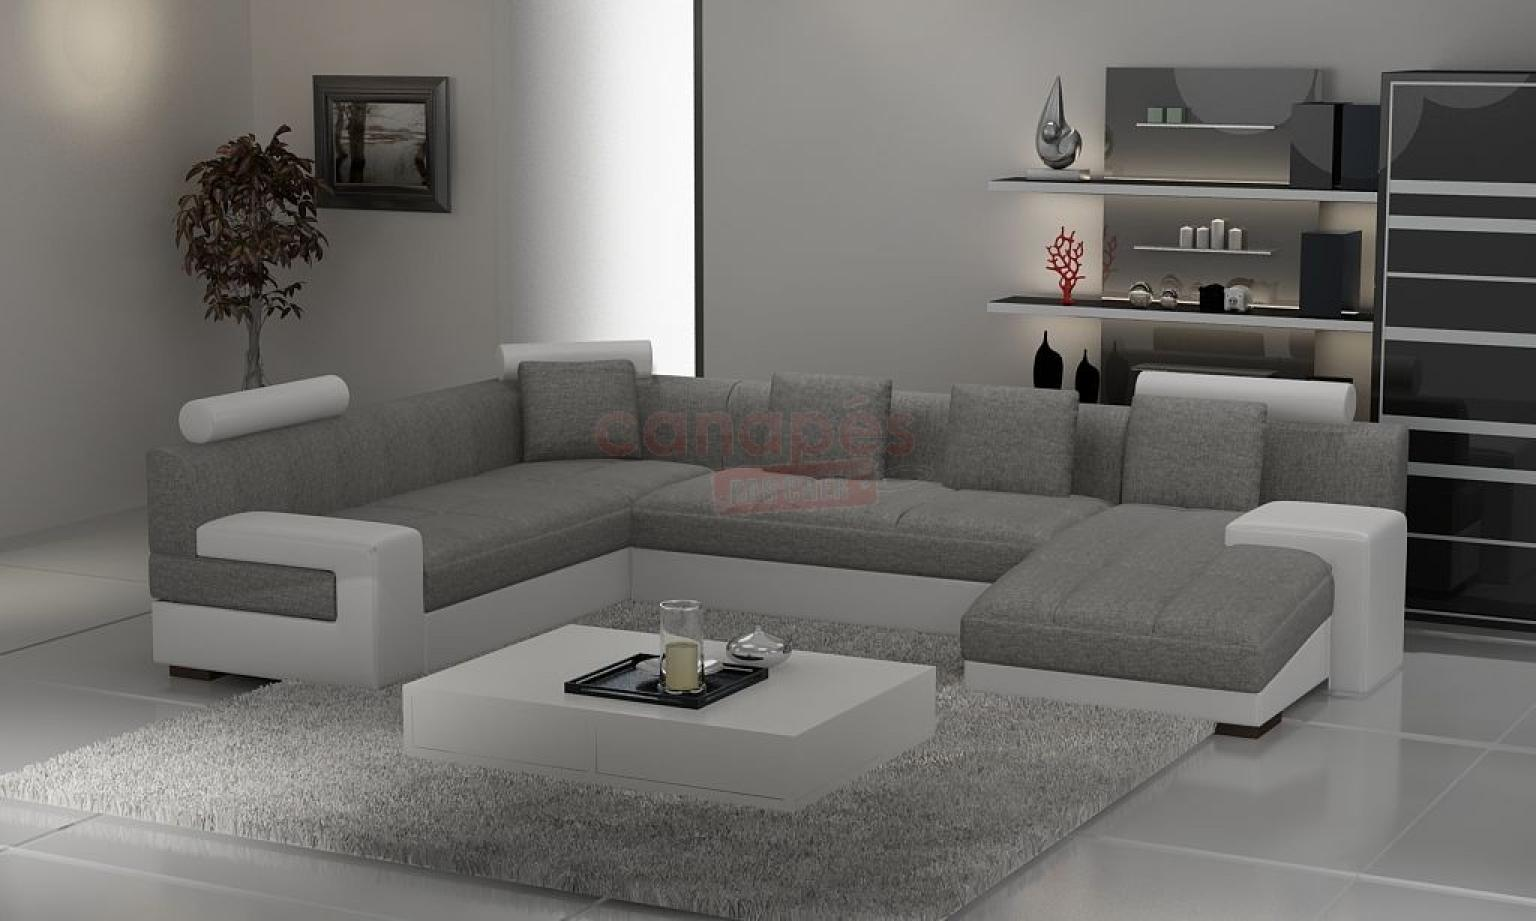 photos canap d 39 angle design microfibre. Black Bedroom Furniture Sets. Home Design Ideas